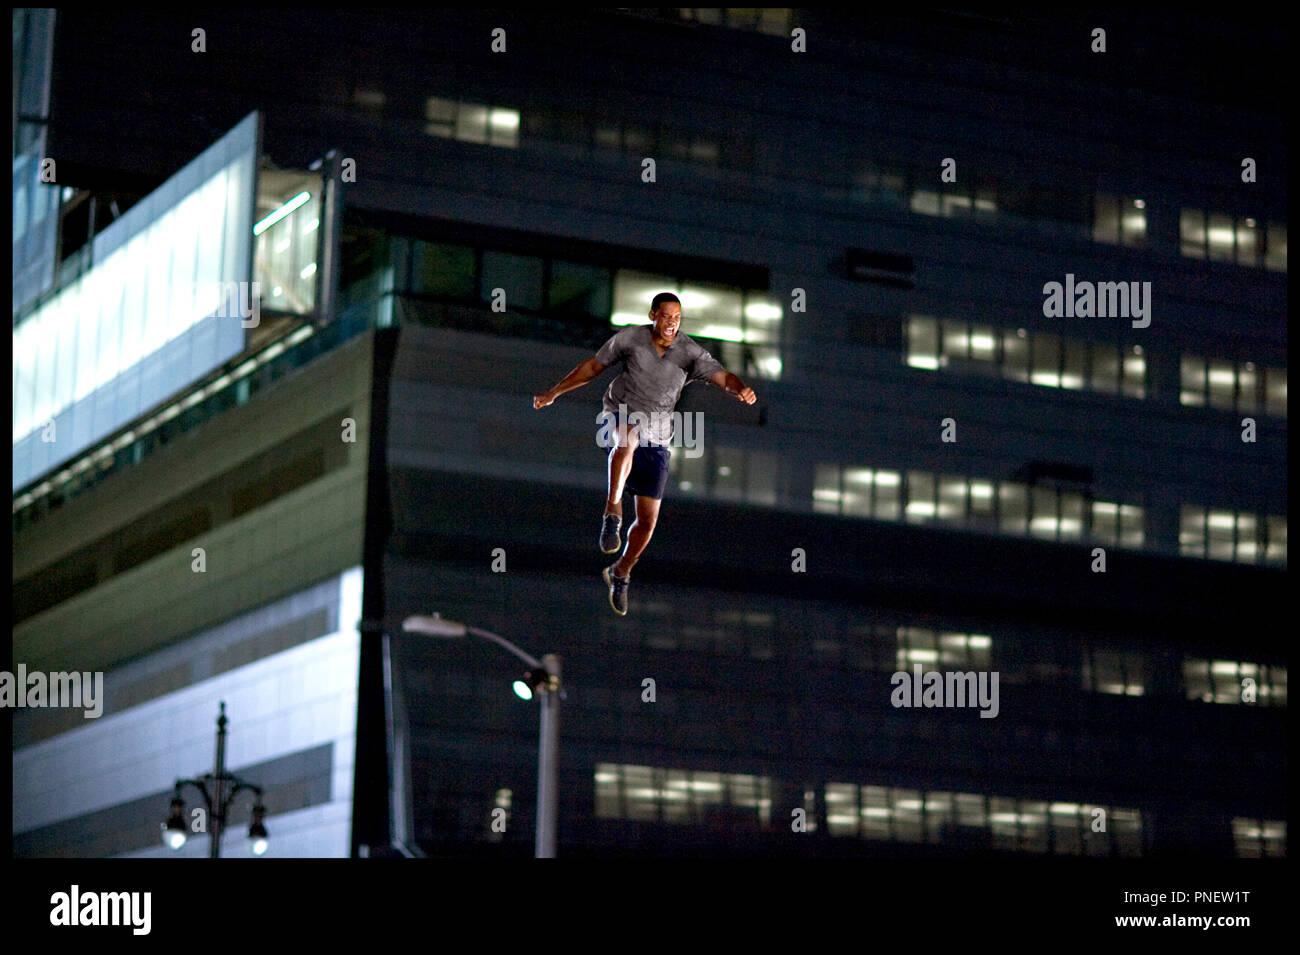 PROD DB © Overbrook Entertainment/médias relativité / DR HANCOCK de Peter Berg 2008 États-Unis Will Smith voler-immeuble-hurler/crieur public Photo Stock